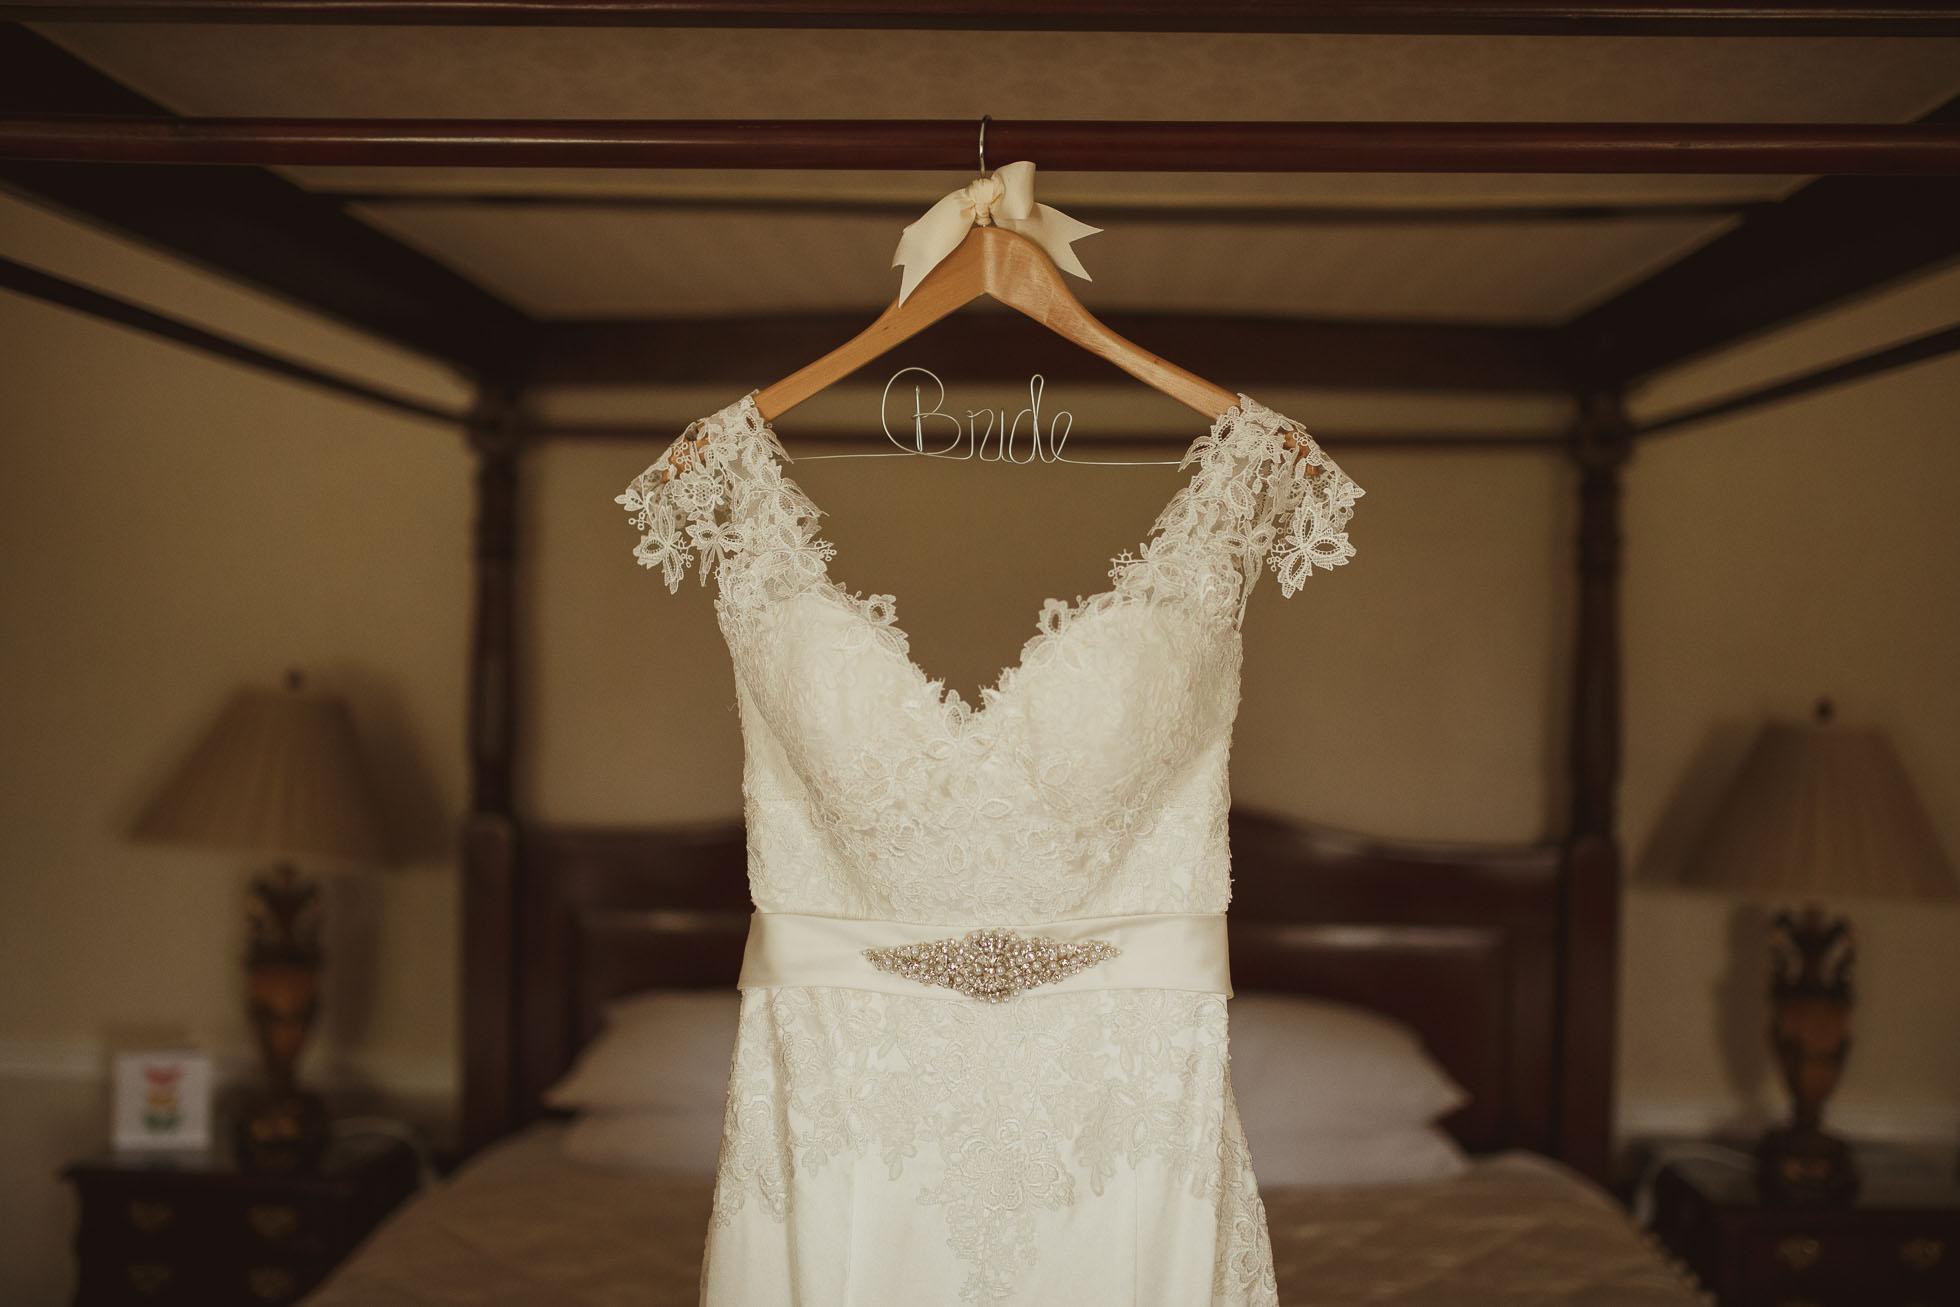 denton-hall-wedding-photographer-1.jpg